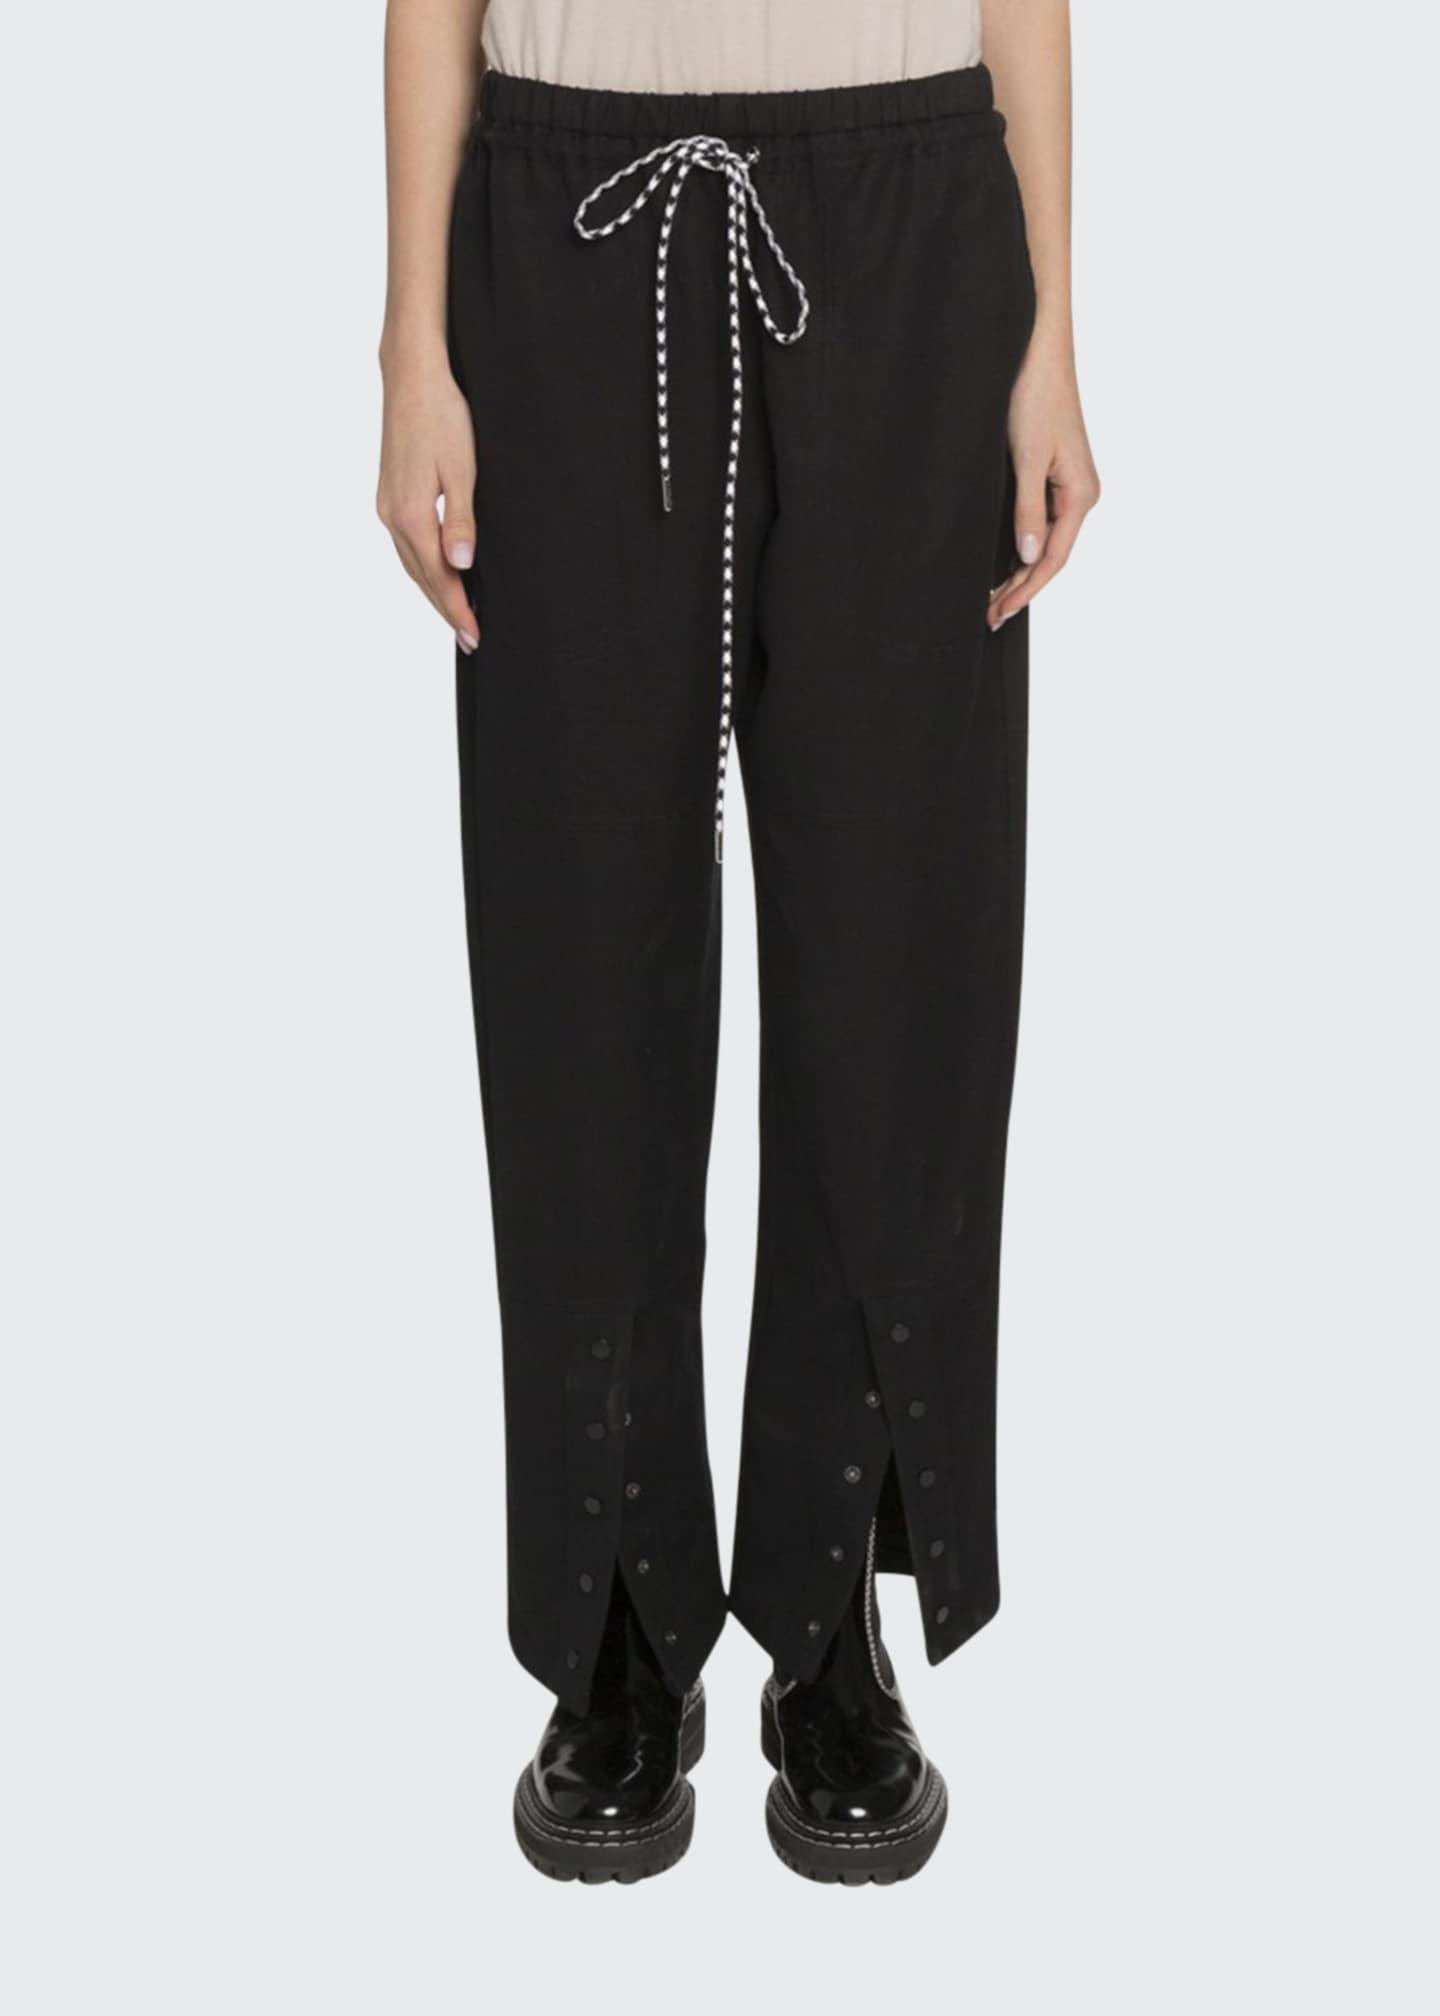 Proenza Schouler White Label Washed Cotton Drawstring Pants